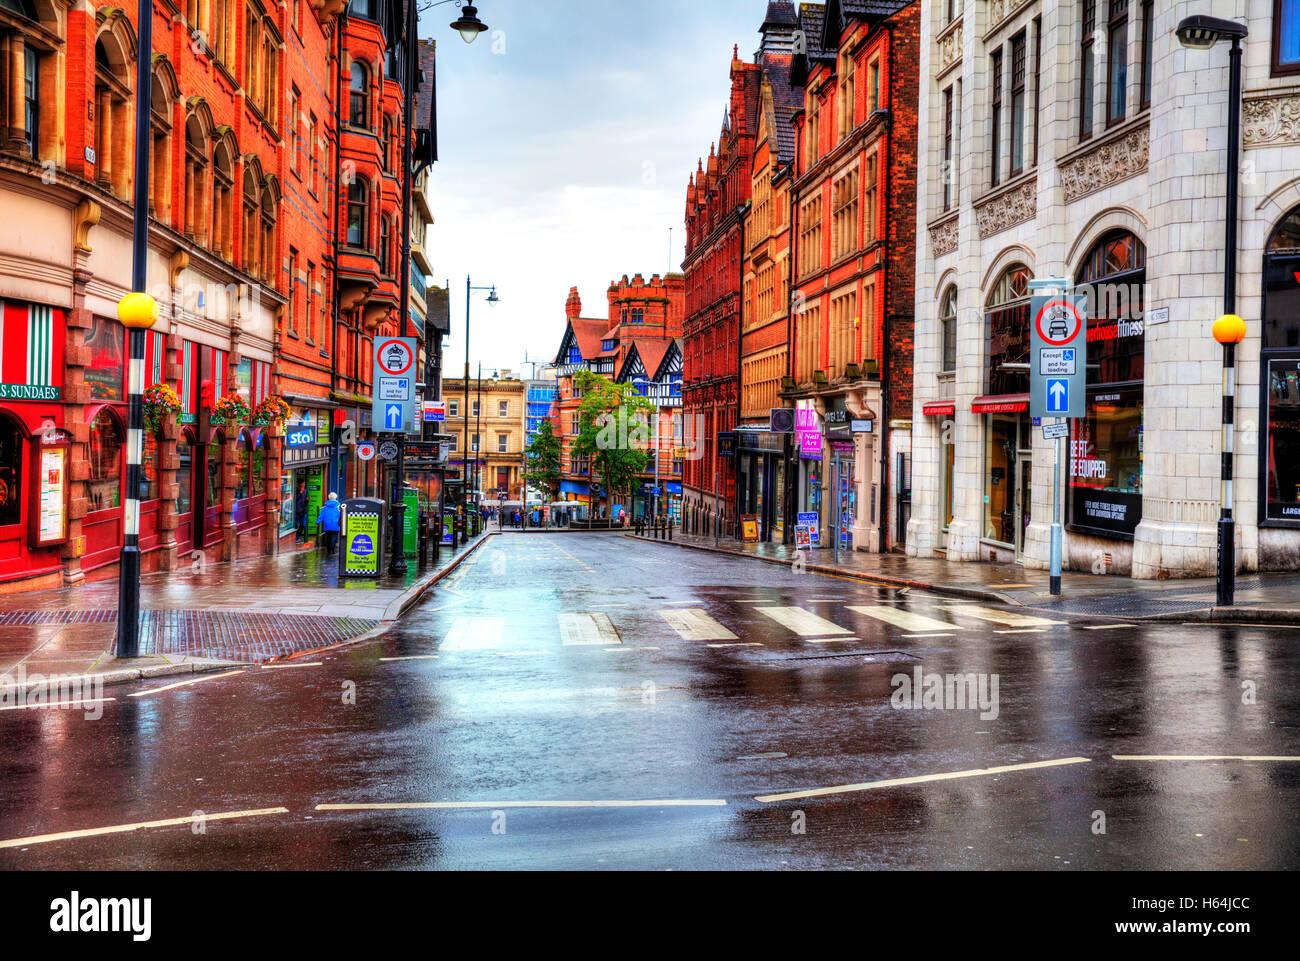 Nottinham City centre buildings shops road roads street streets pelican crossing King Street Nottingham cities UK - Stock Image